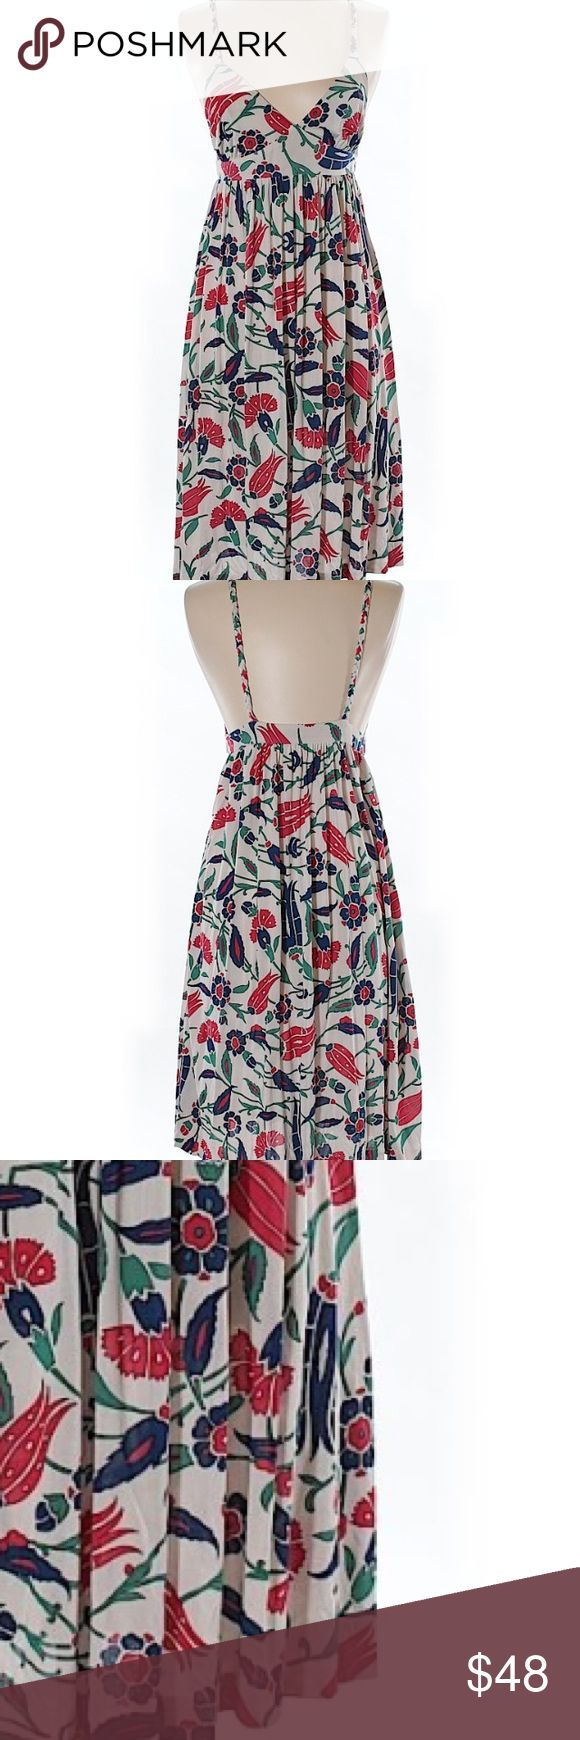 "Anthropologie / Nervis Lavi Printed Silk Dress Gently used. 100% Silk. 24"" chest, 27"" length. Anthropologie Dresses"